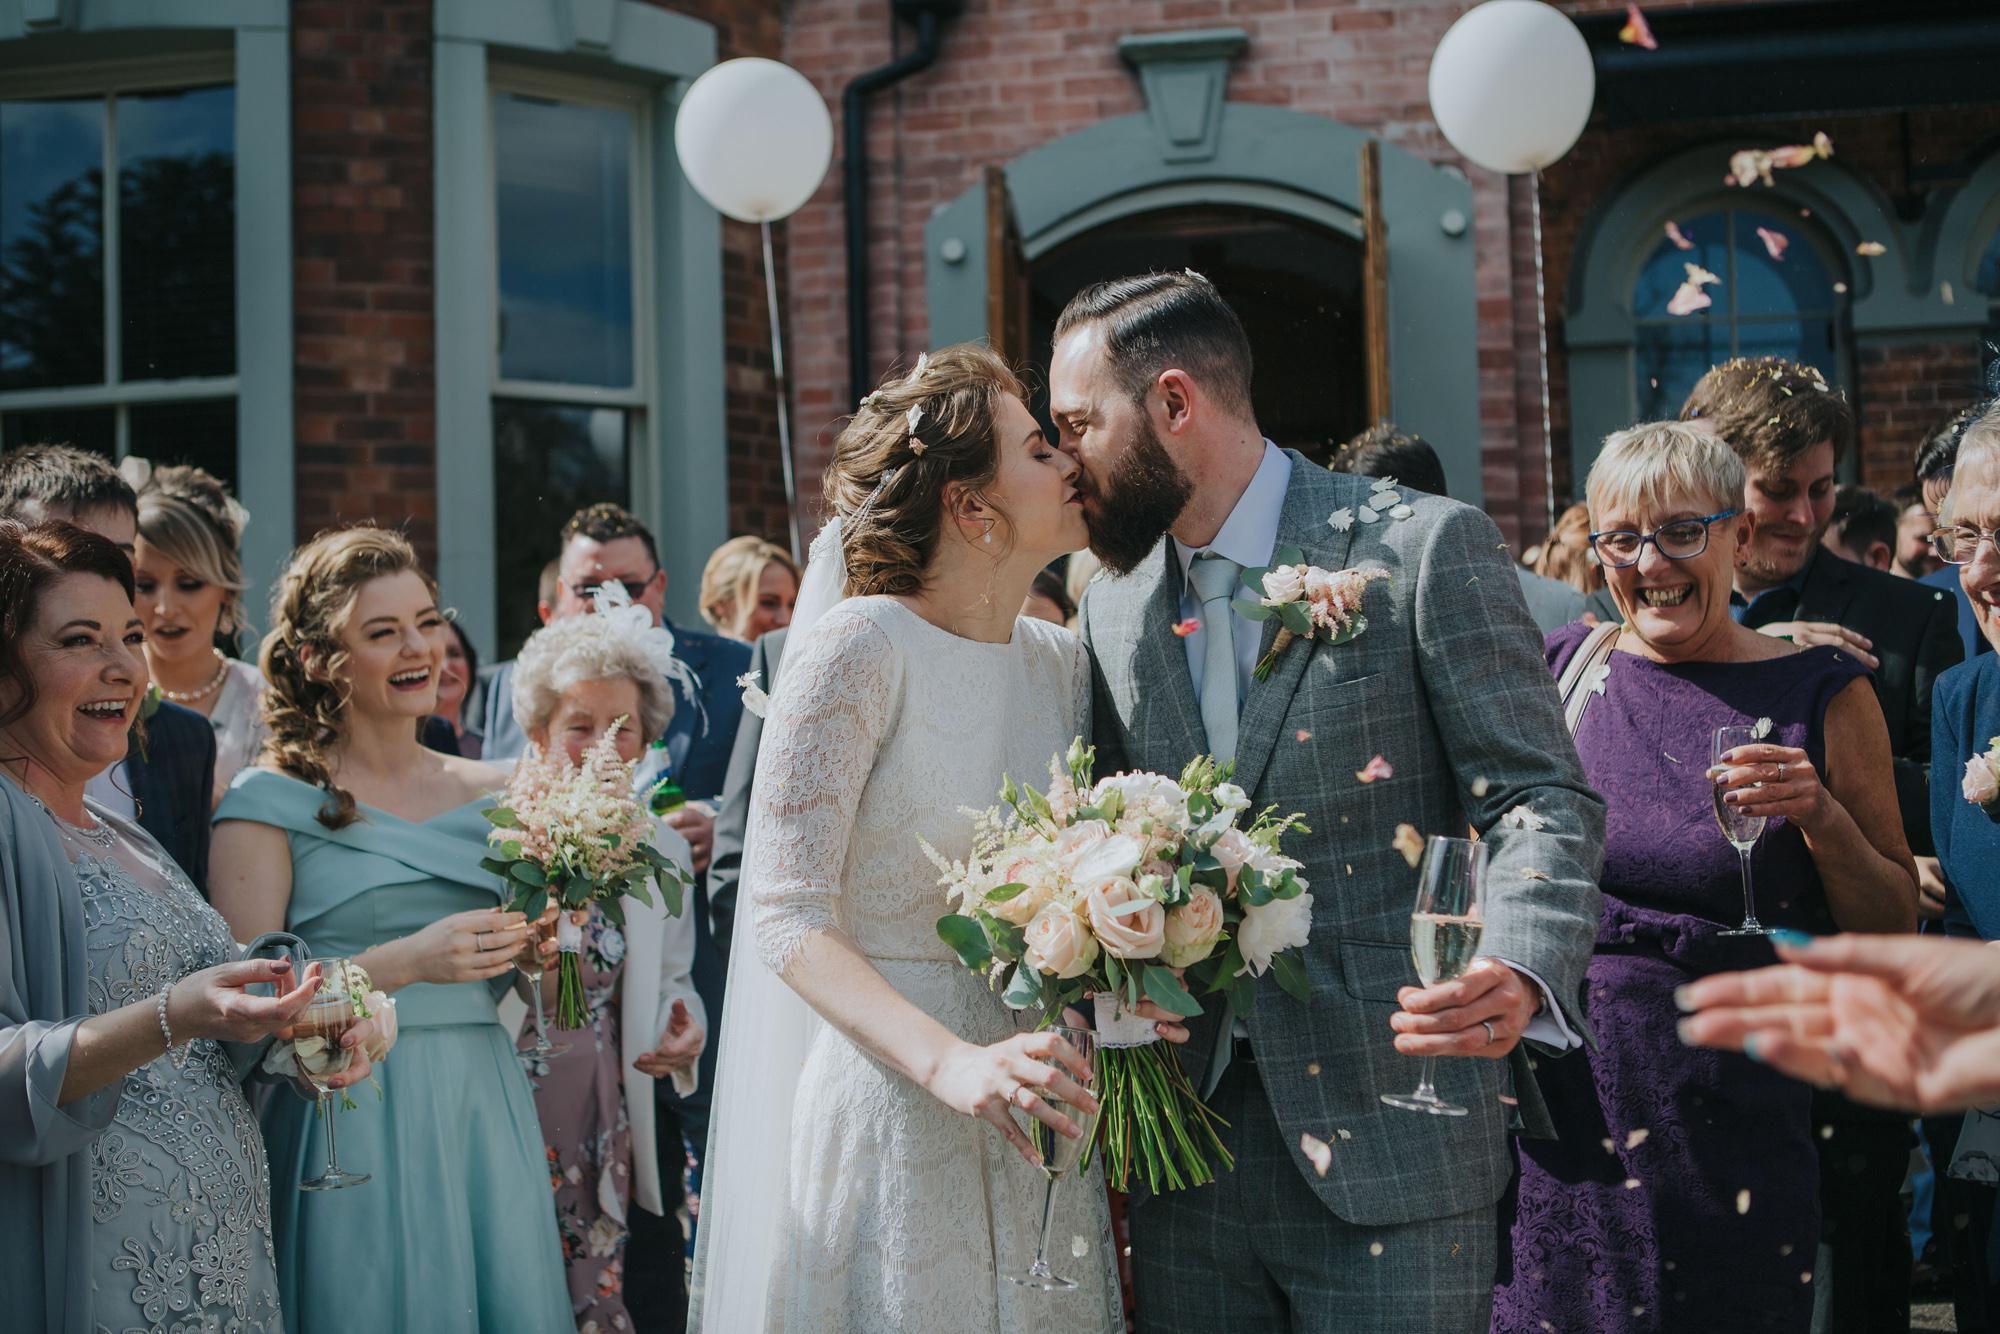 Kate-Beaumont-Lace-Flared-Dahlia-Gown-Leeds-Wedding-Bloom-Weddings-30.jpg